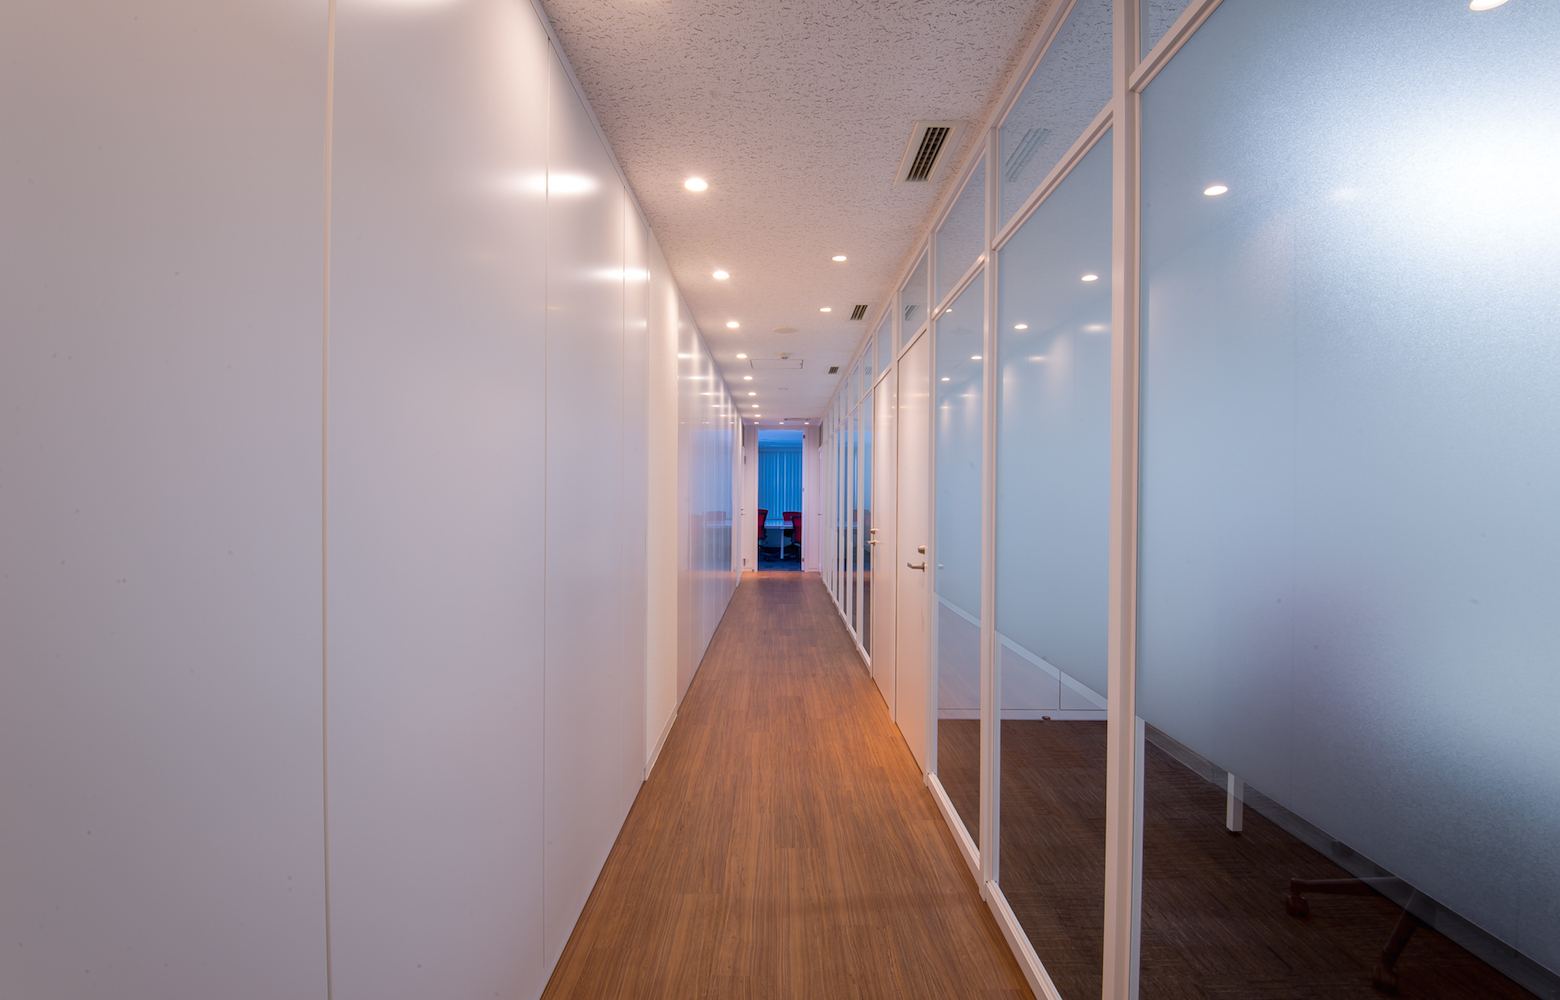 UIEvolution株式会社 vol.1 Corridor デザイン・レイアウト事例